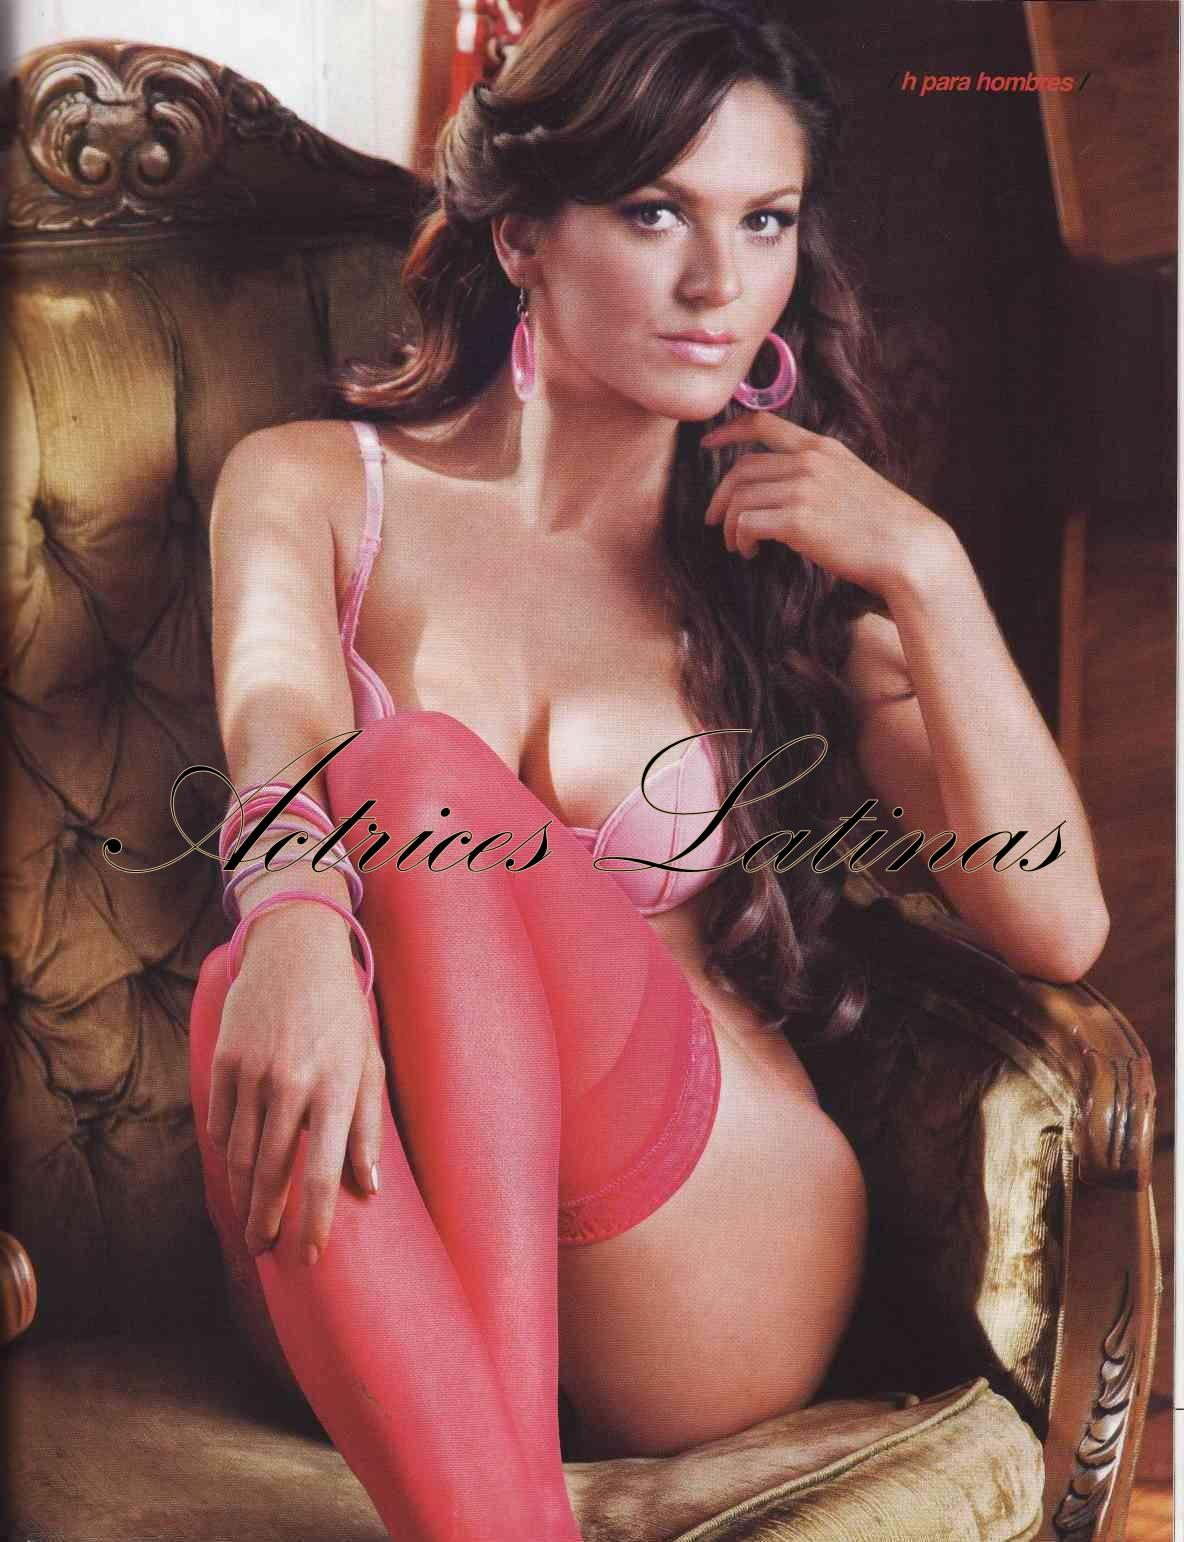 Marlene favela lenceria en revista h - 3 3